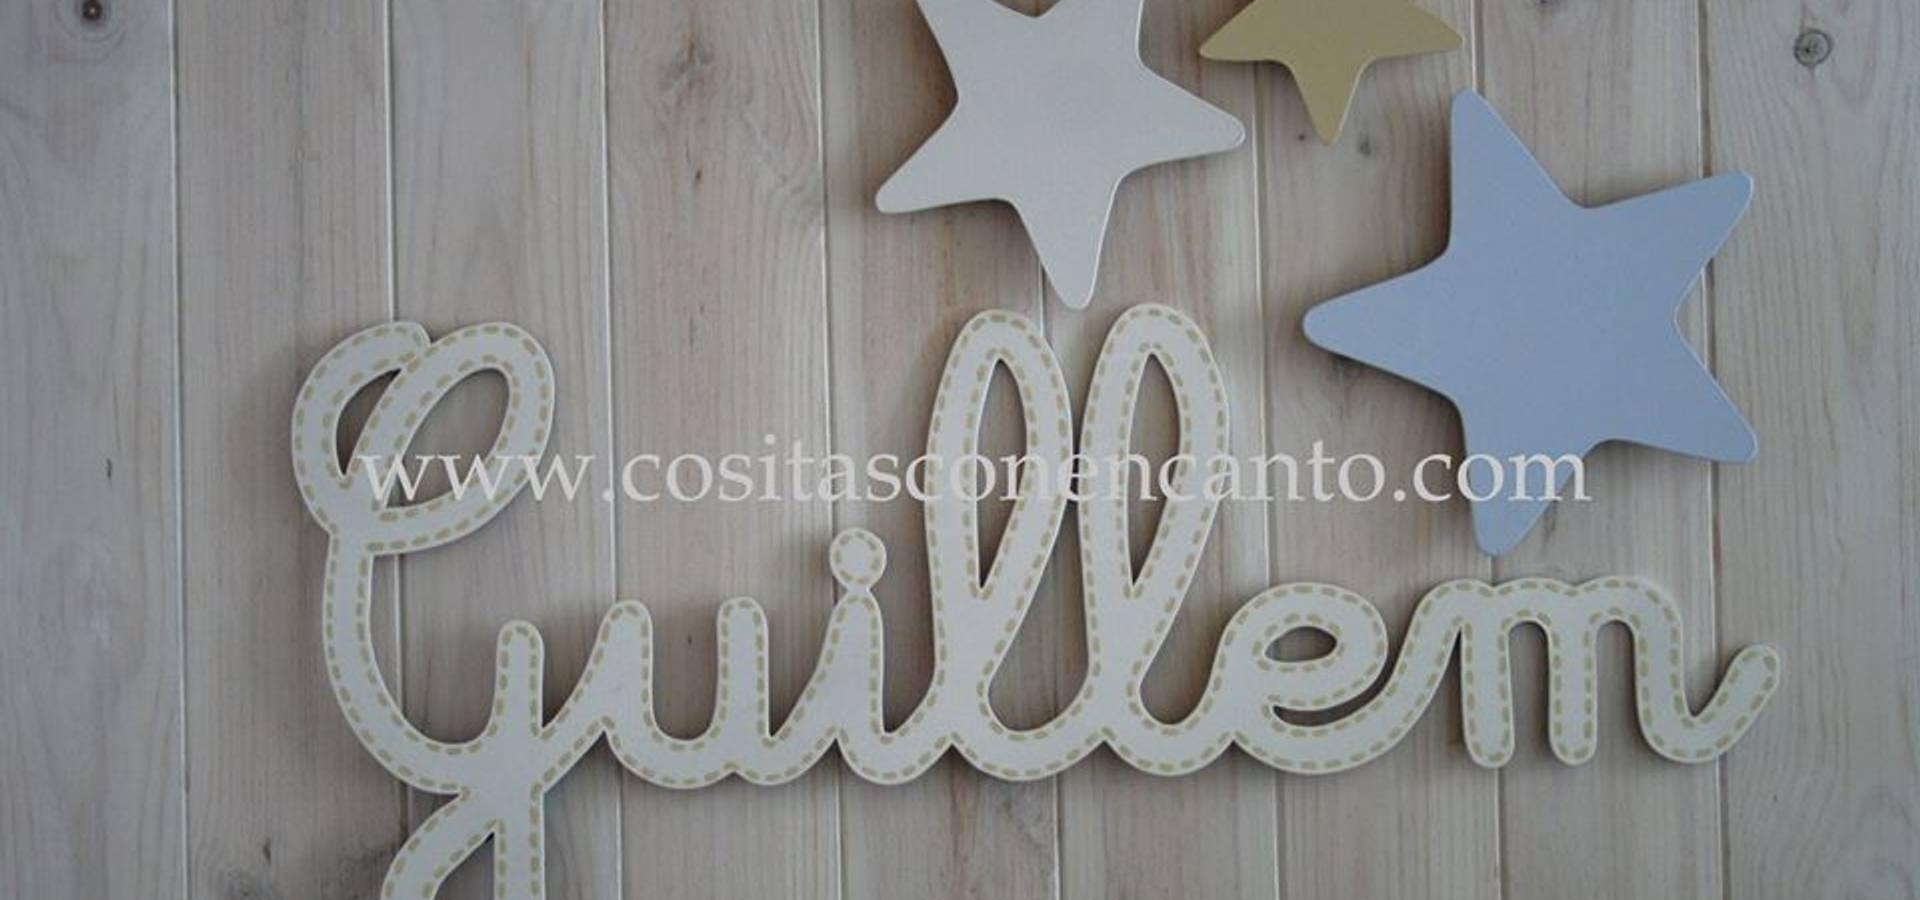 Cositasconencanto decoradores y dise adores de interiores - Disenadores en valencia ...